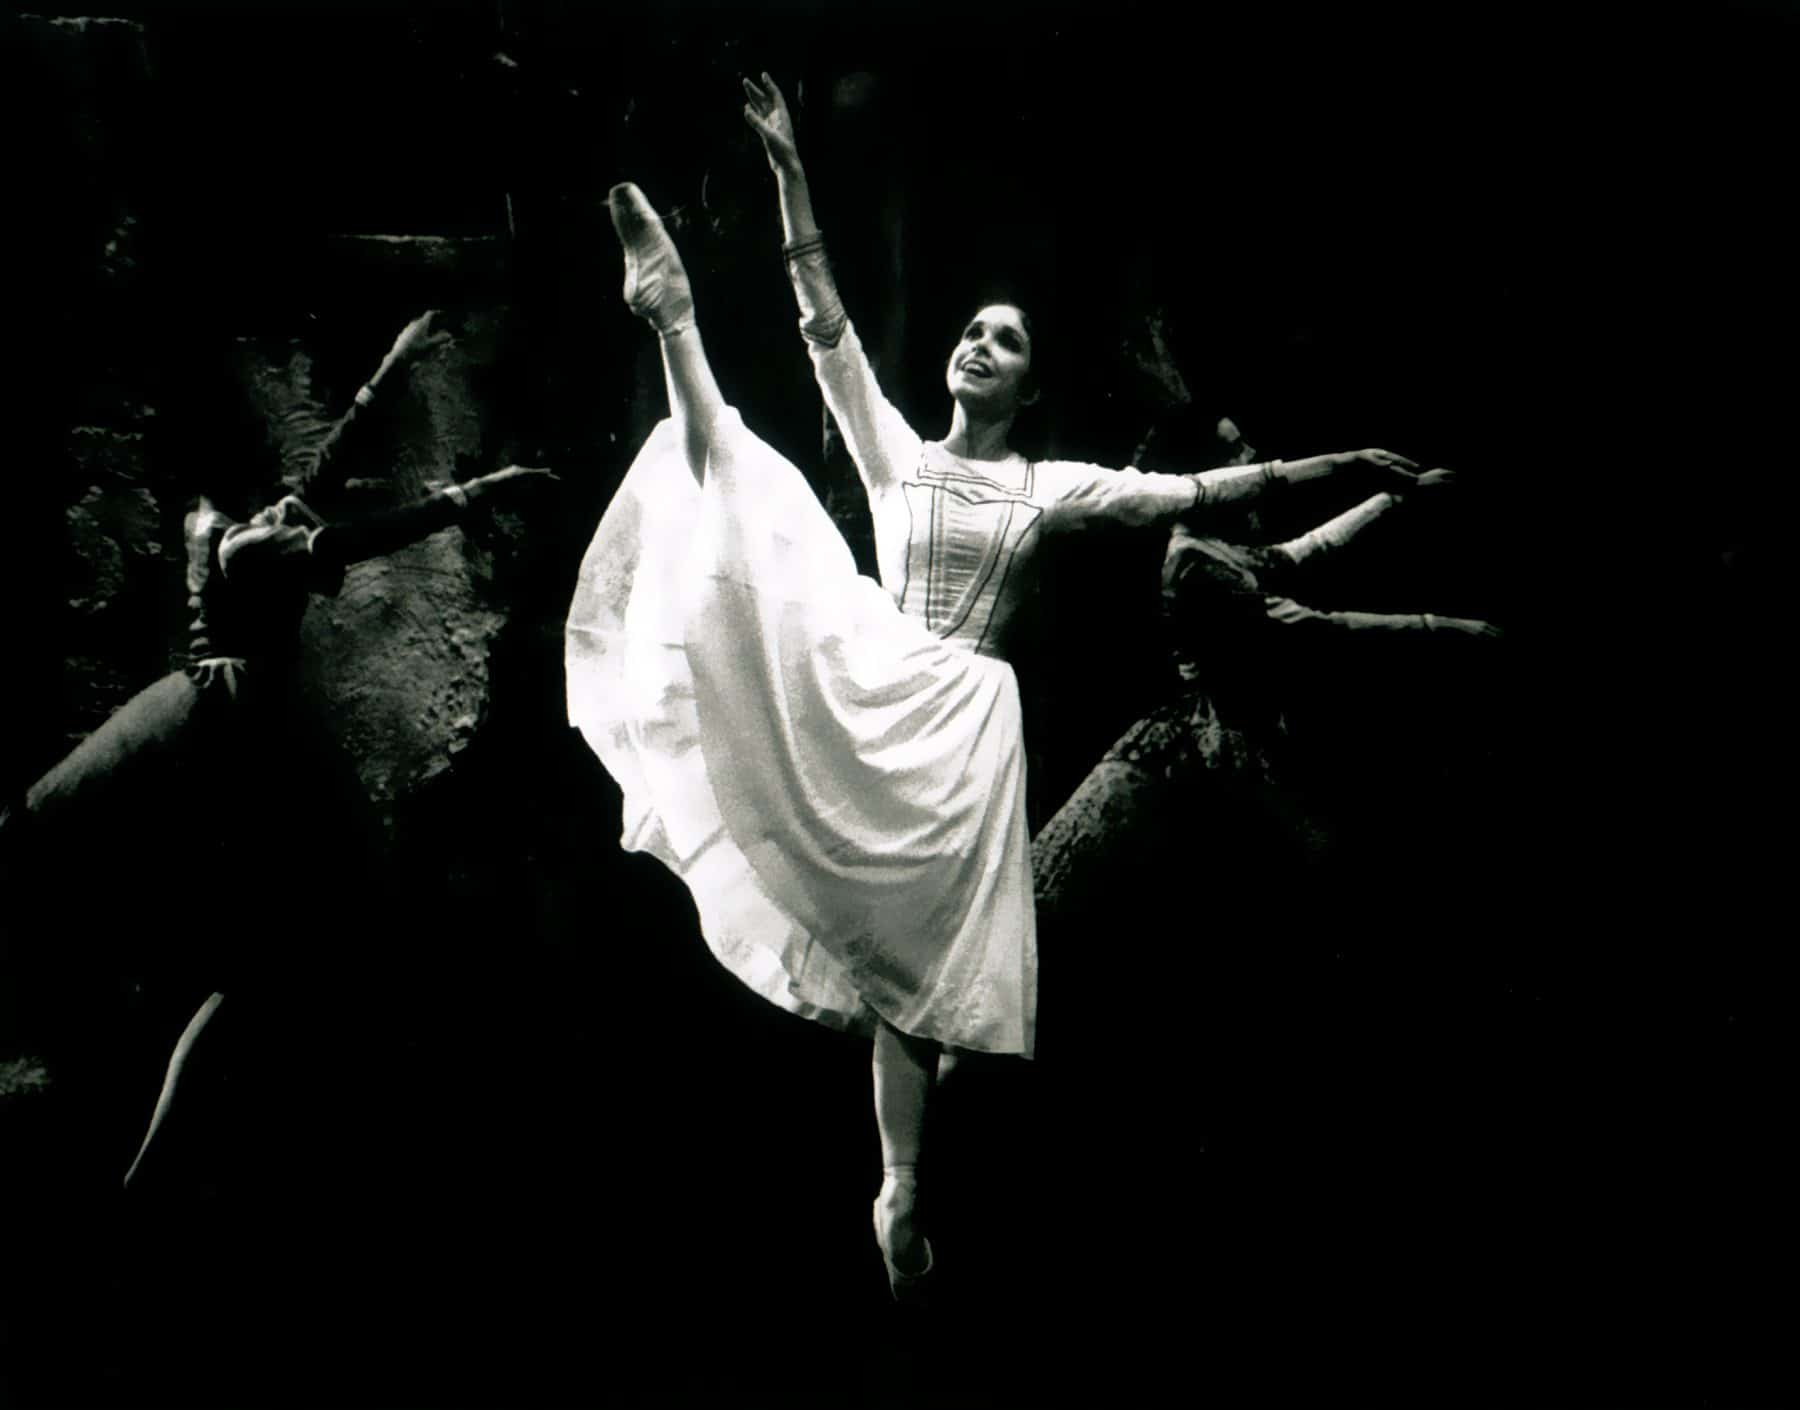 Rosetta Cook: Giselle ACT 1, 1985